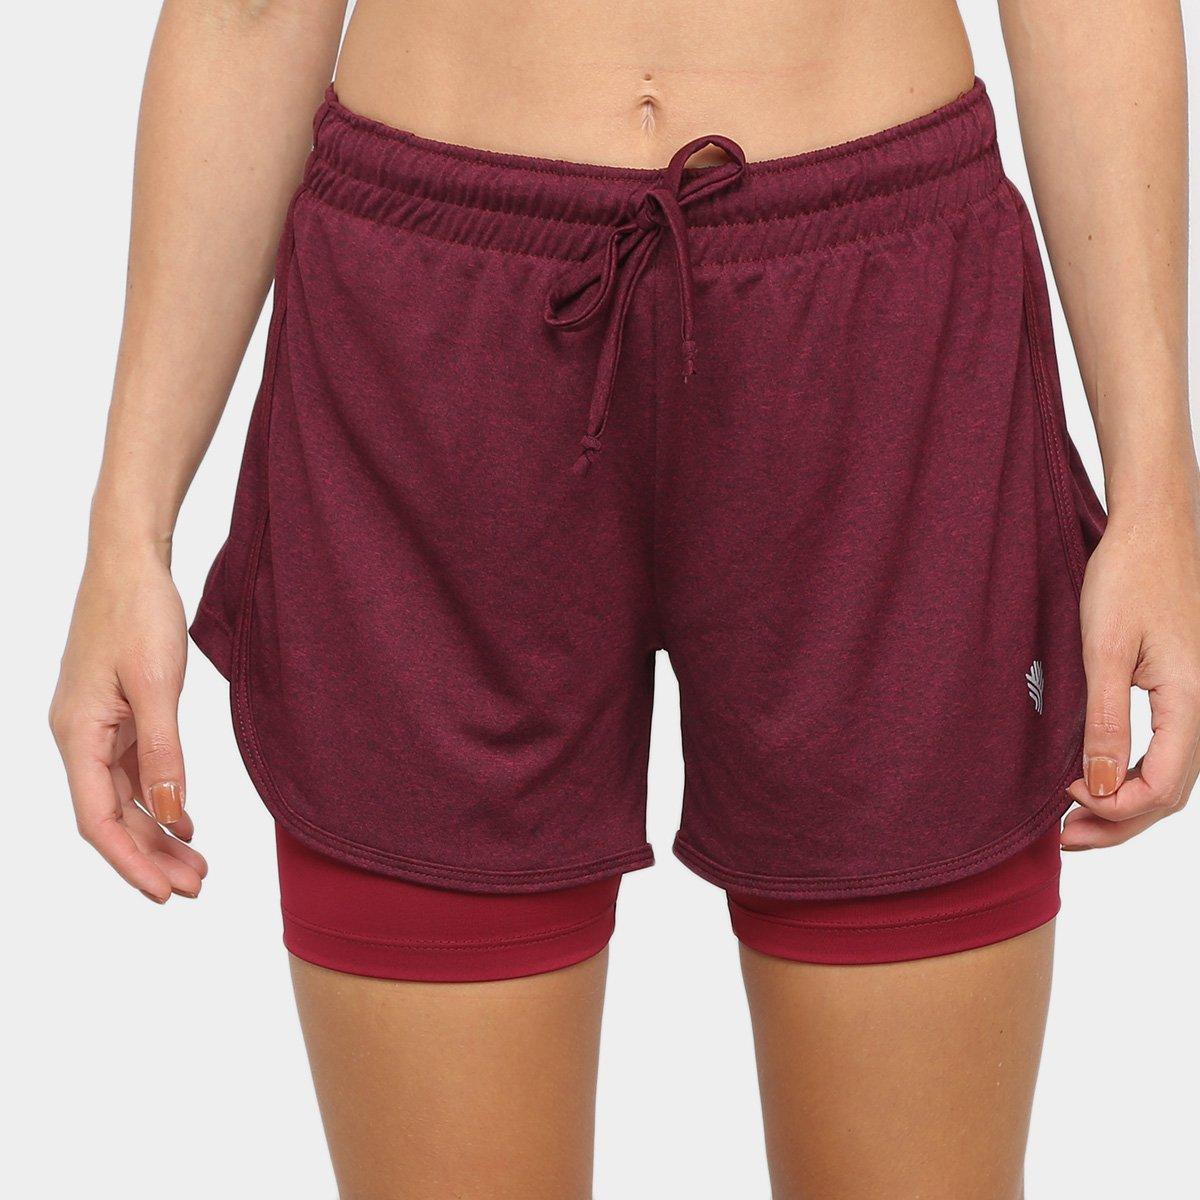 Shorts Gonew Compressão Feminino